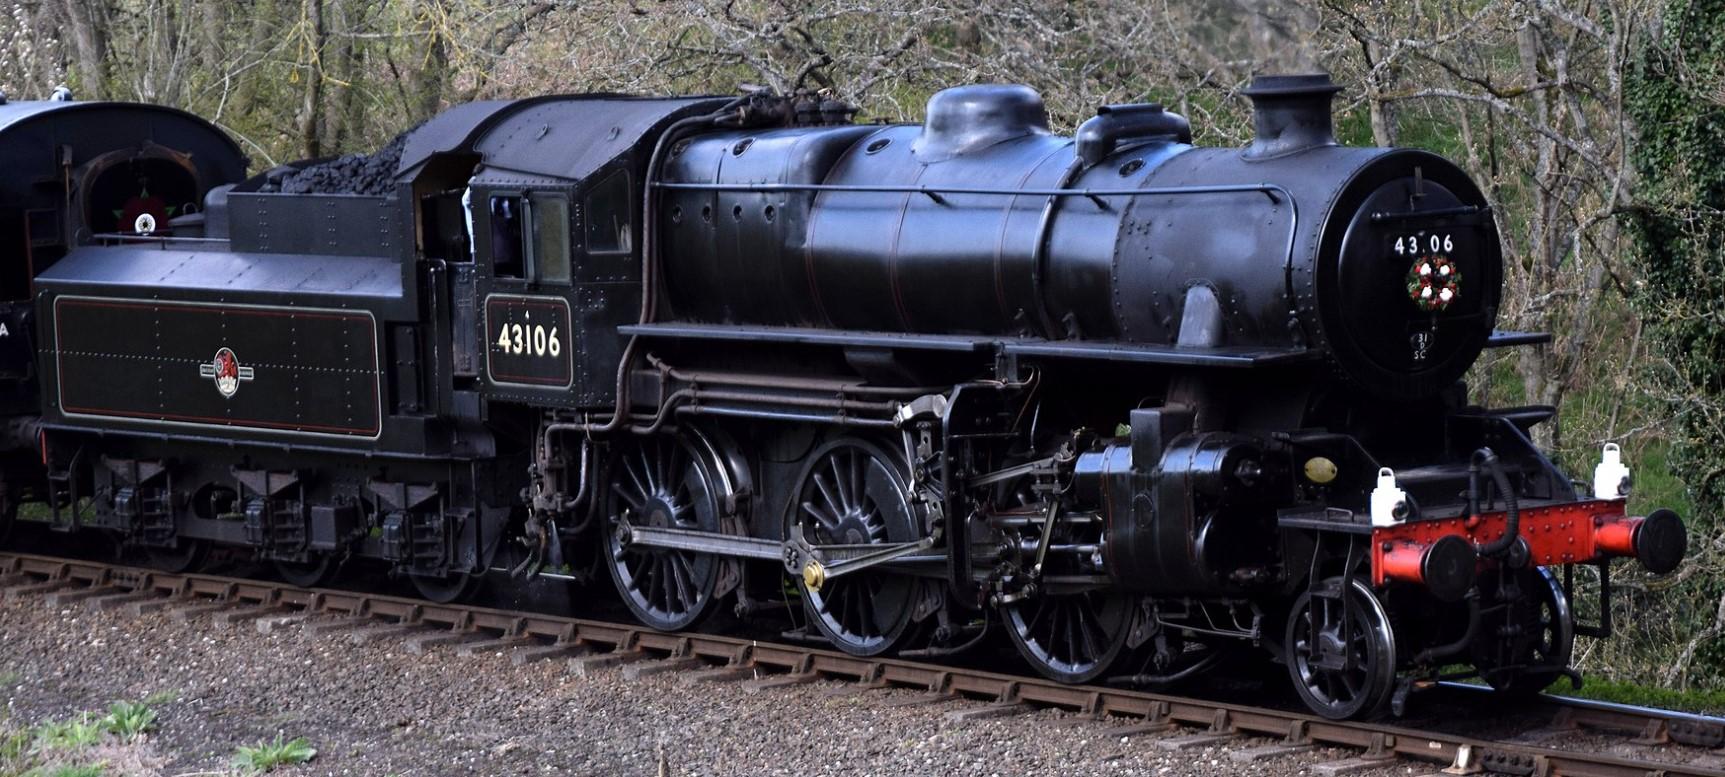 43106 on the Severn Valley Railway in April 2021. ©Hugh Llewelyn